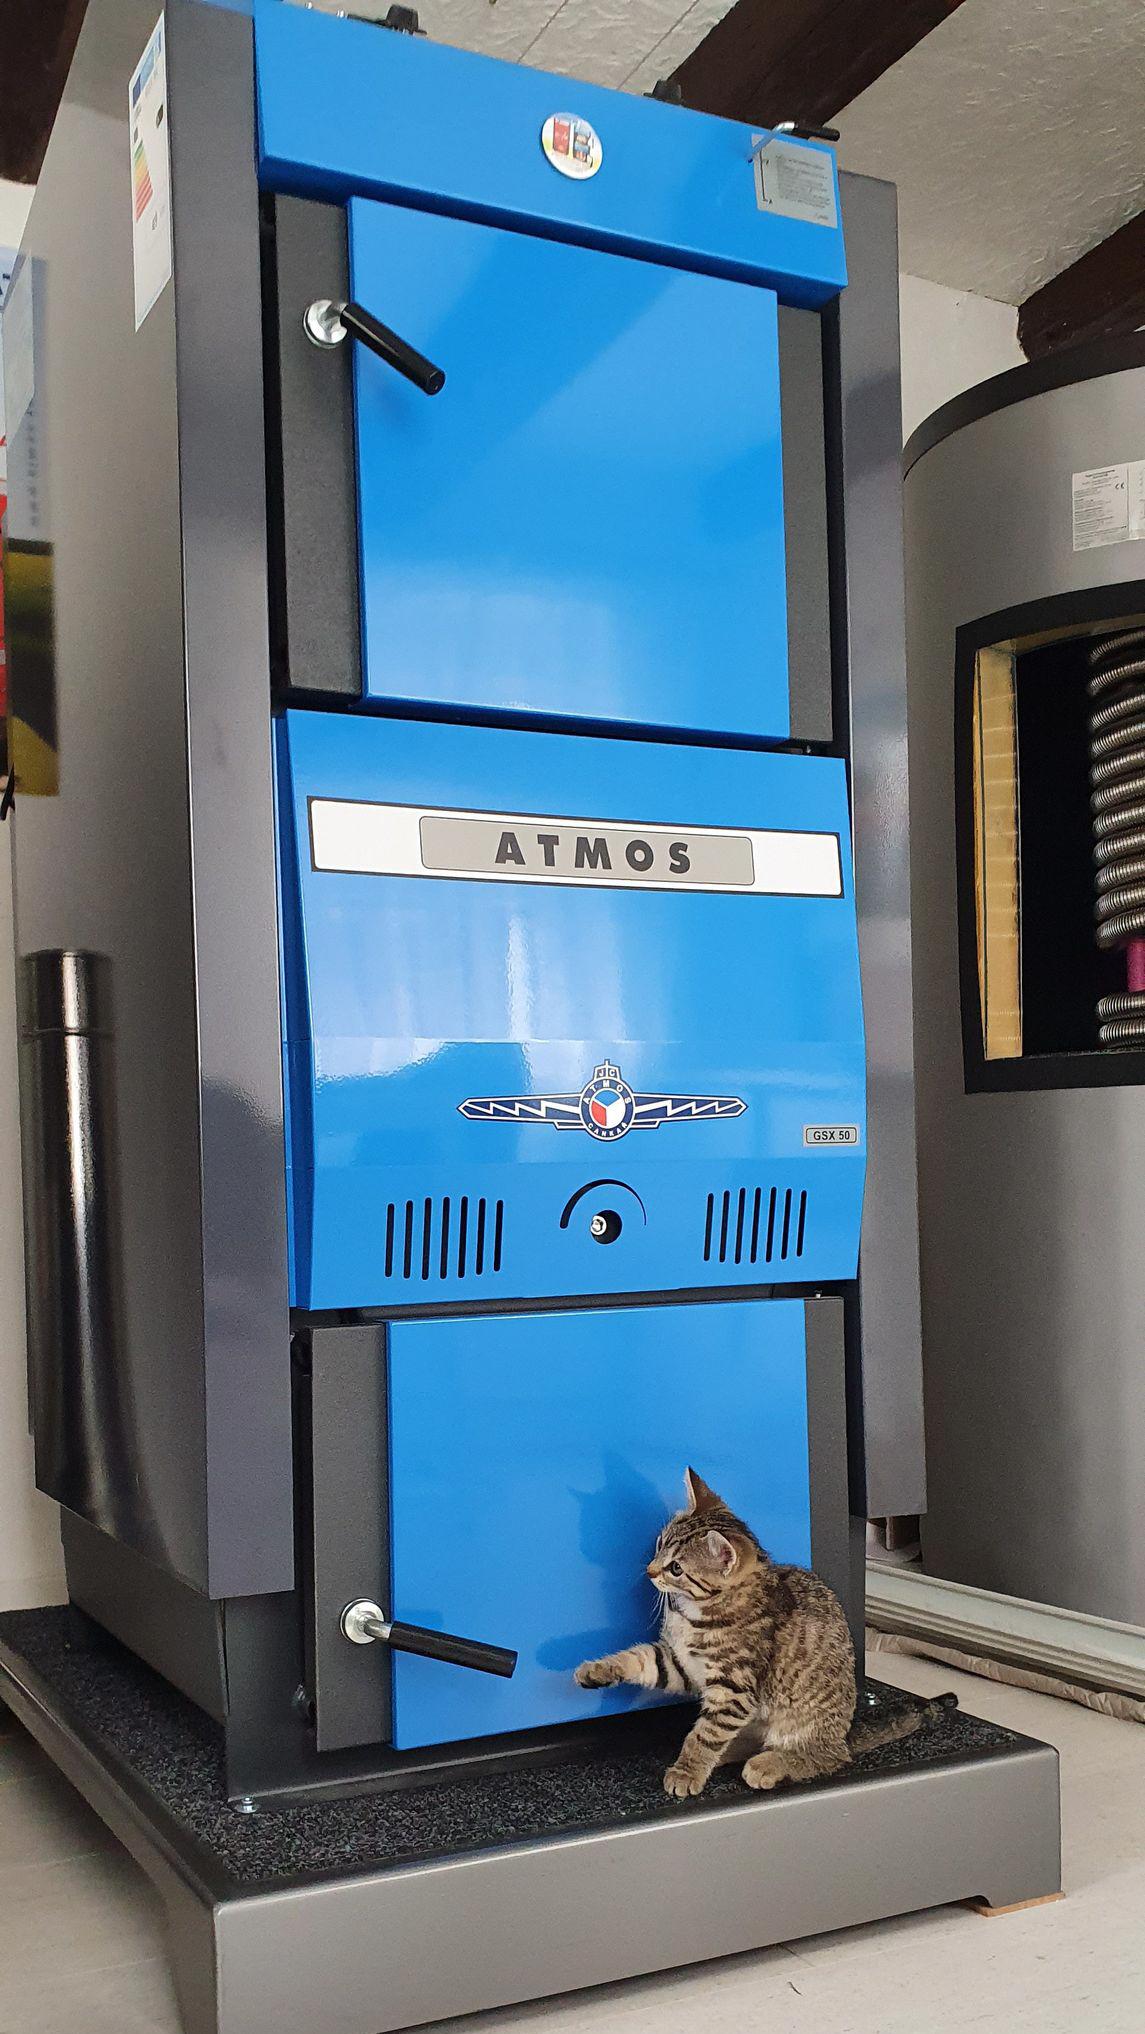 Holzvergaserkessel ATMOS GSX50 mit Katze Killus Technik